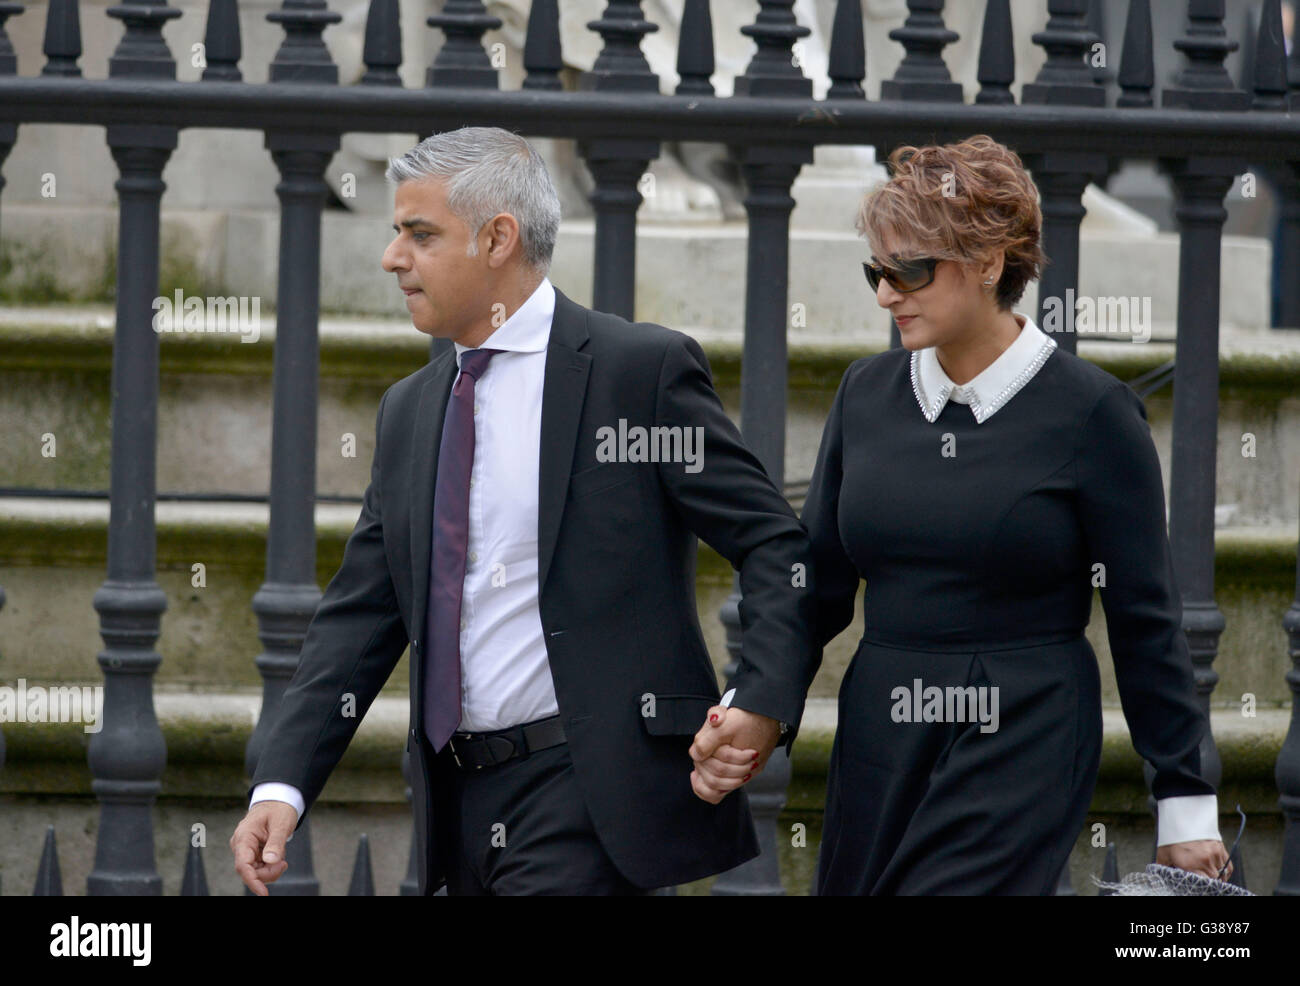 Sadiq Khan and Saadiya, 'London Mayor' in London, Britain, UK - Stock Image